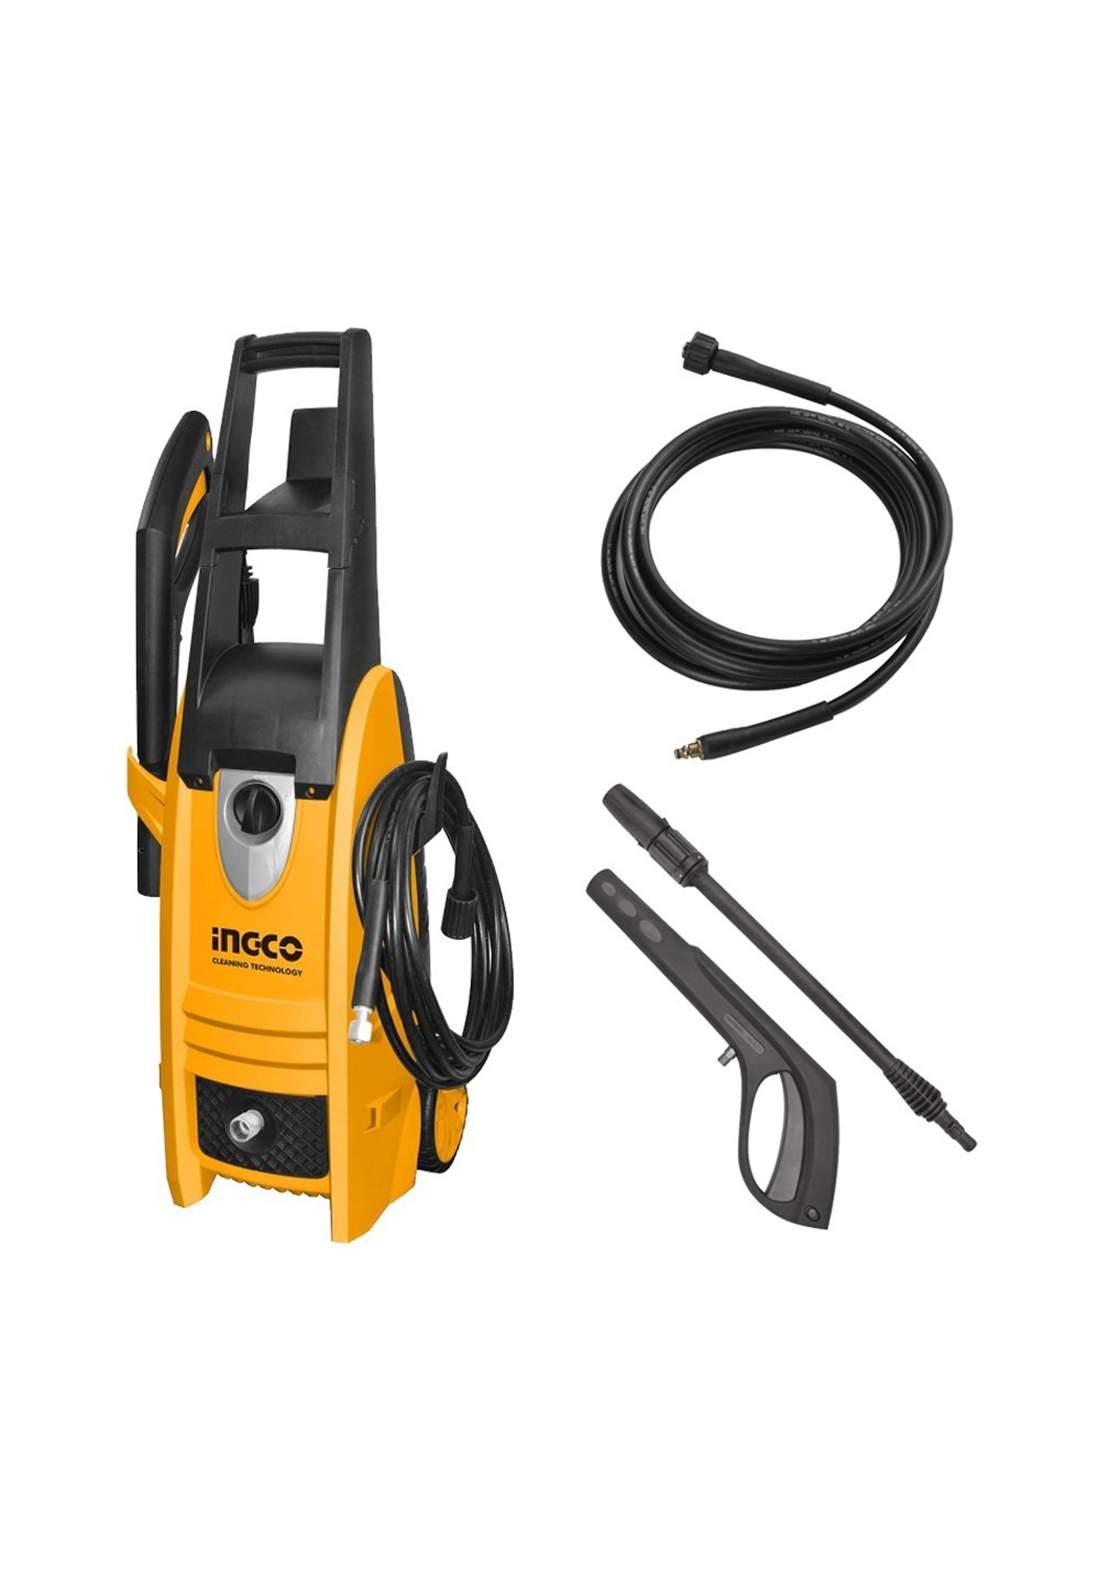 Ingco Hpwr 15002 High Pressure Washer ماكنة غسل 1500 واط